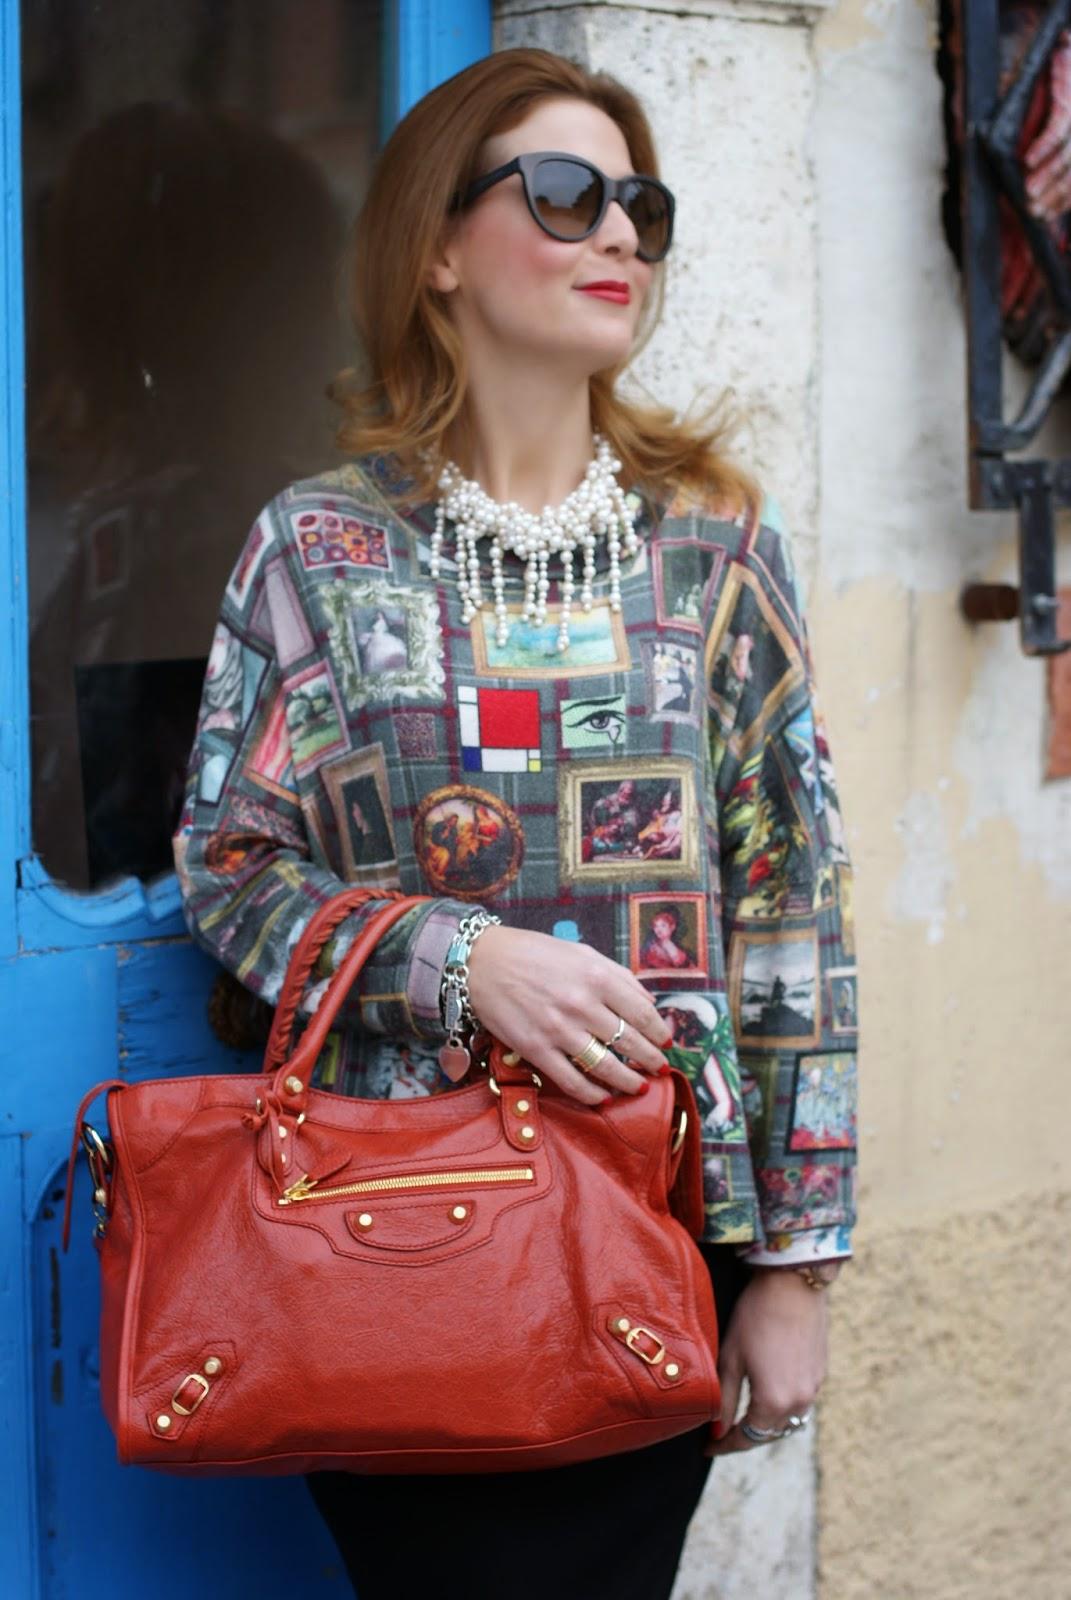 Asos midi pencil skirt, Balenciaga City bag, Nando Muzi brogues, Fashion and Cookies, fashion blogger